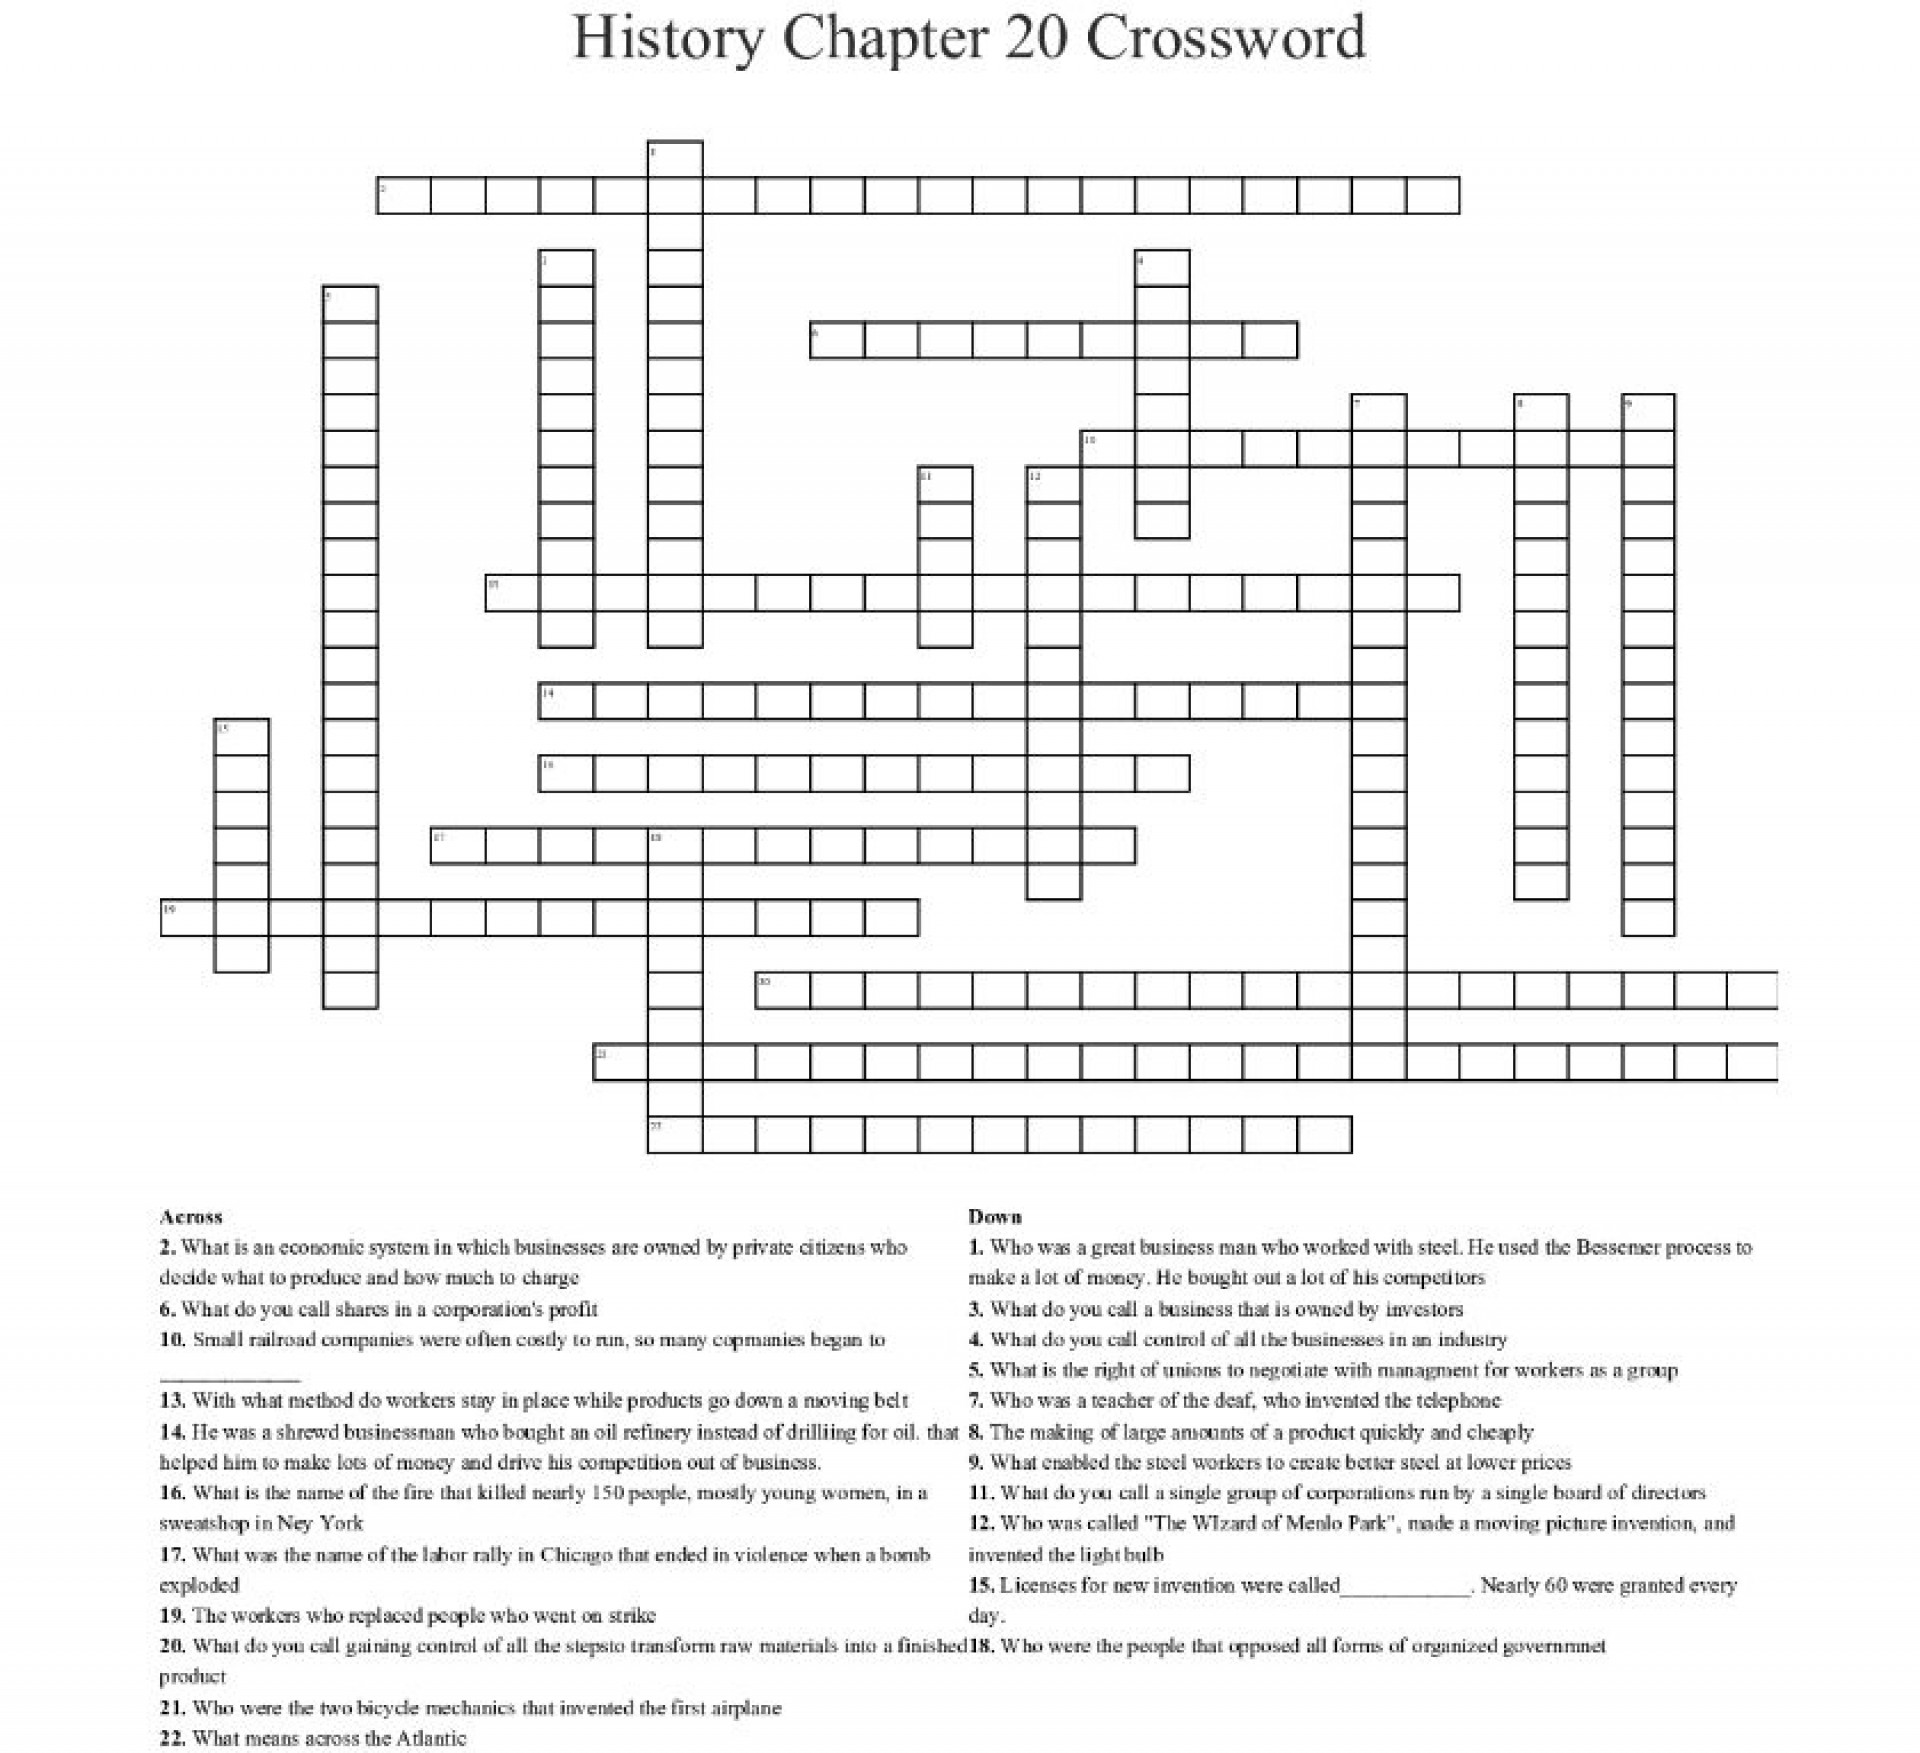 002 Frightening Prosperity Crossword Sample  Hollow Sound Of Sudden Clue Material 7 Letter1920